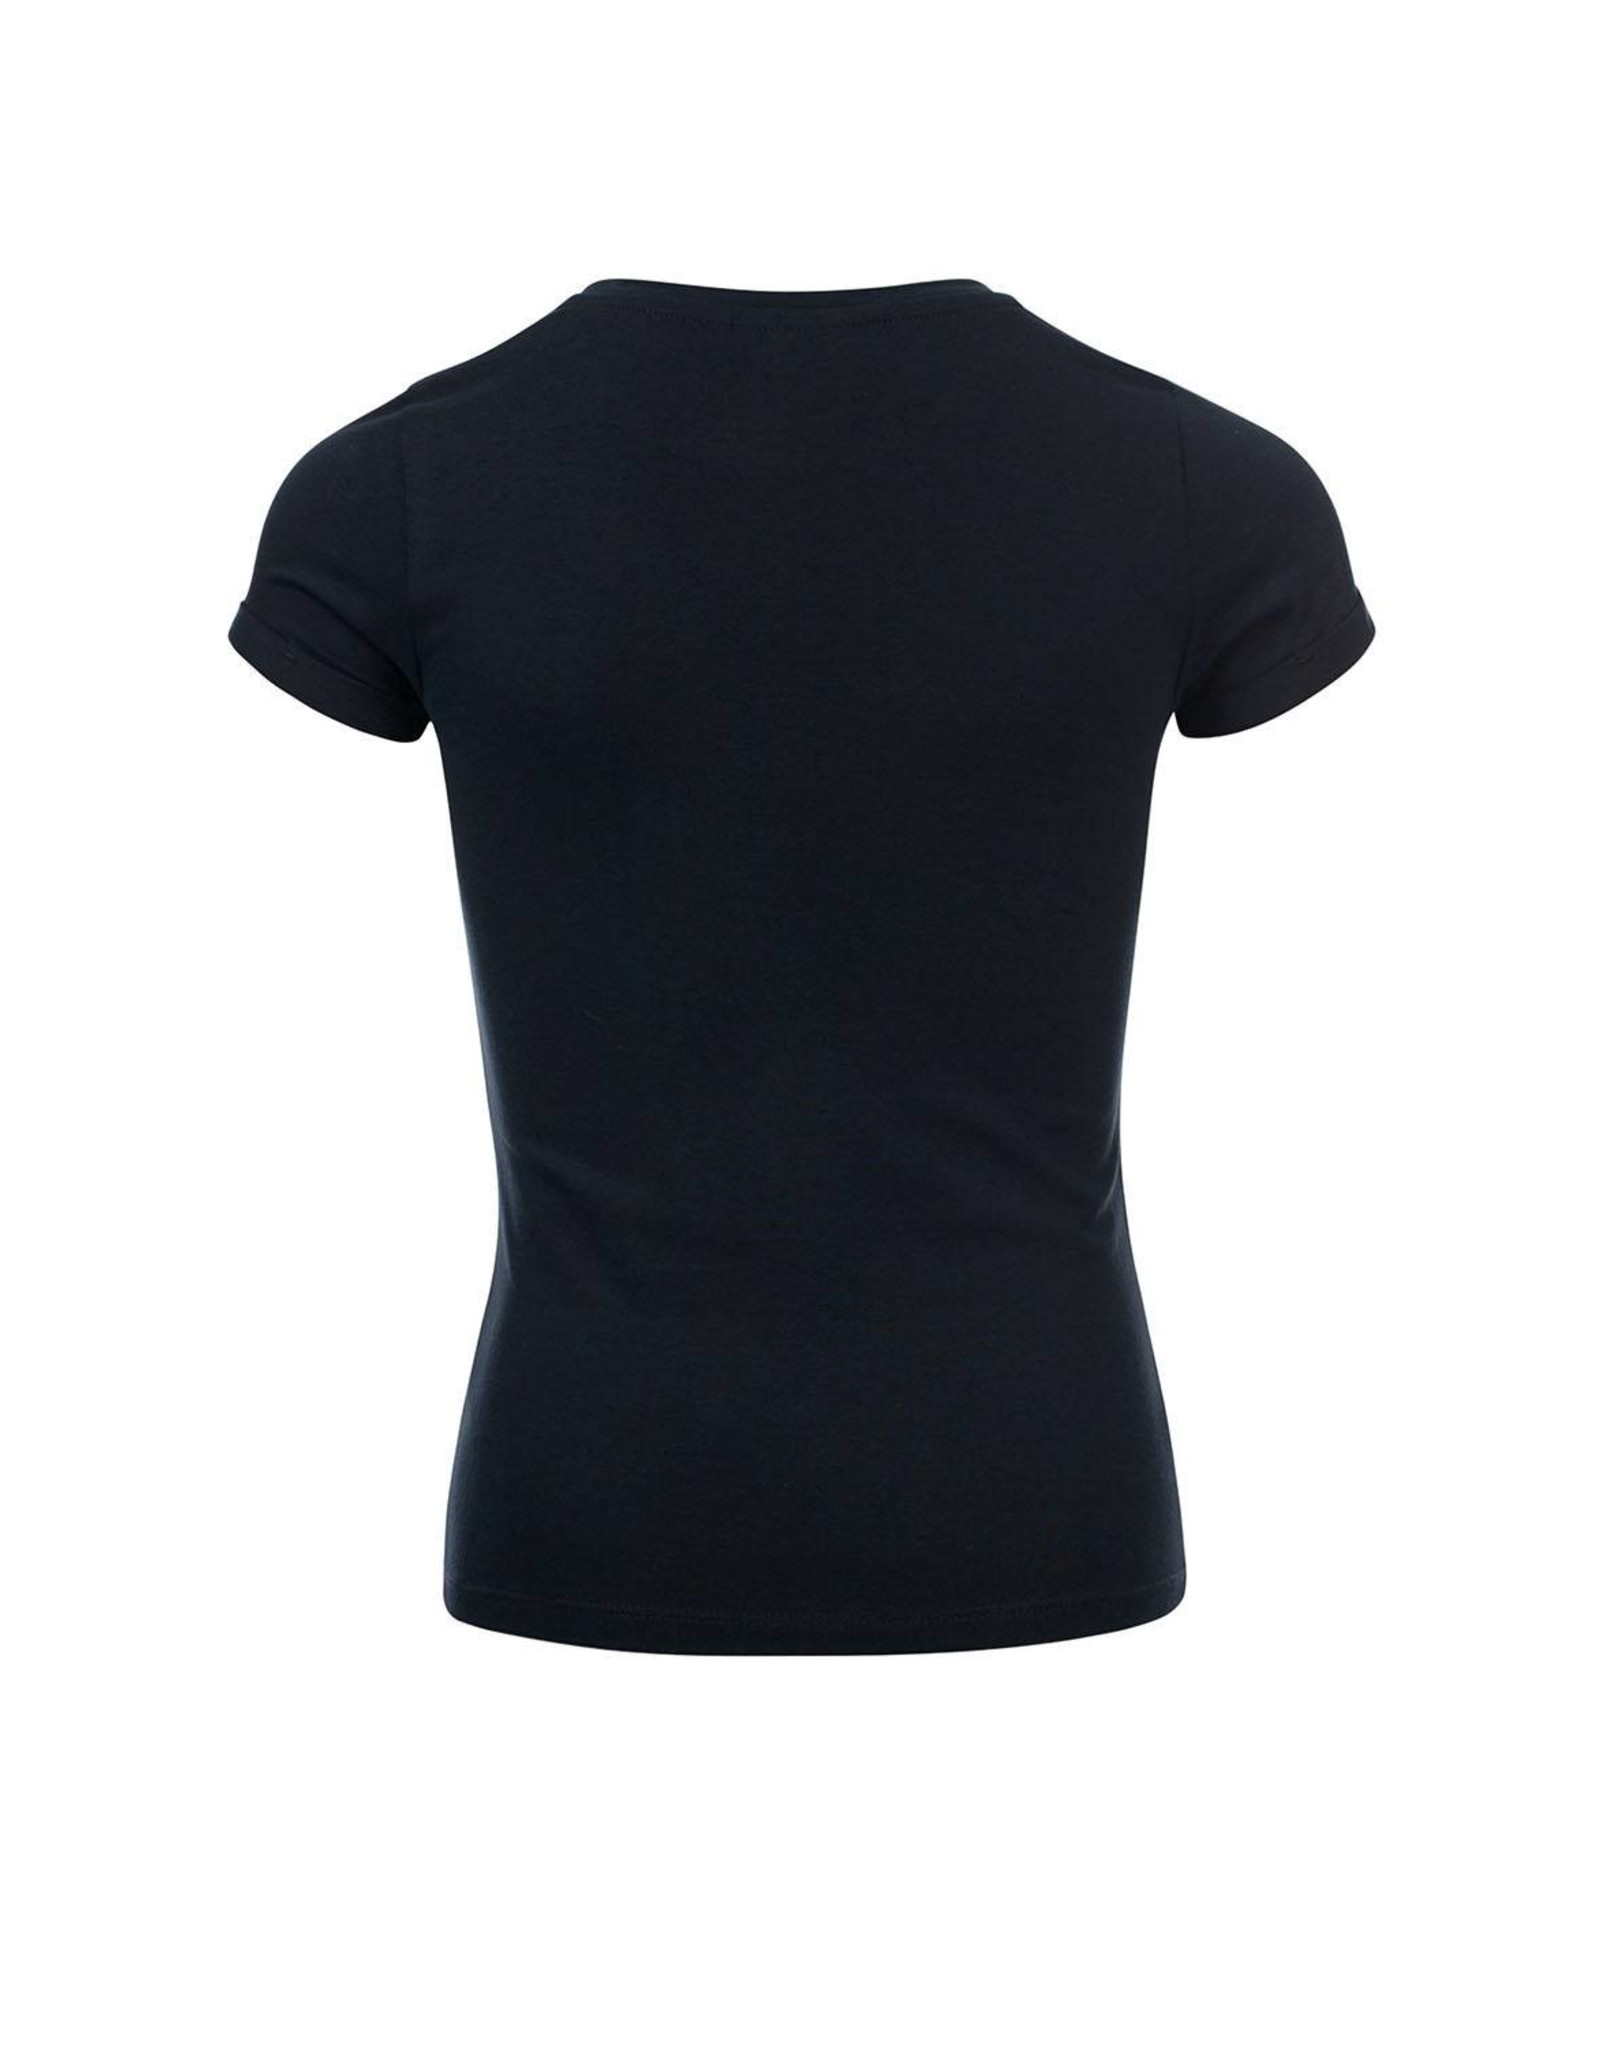 LOOXS 10sixteen T-shirt OXFORD BLUE